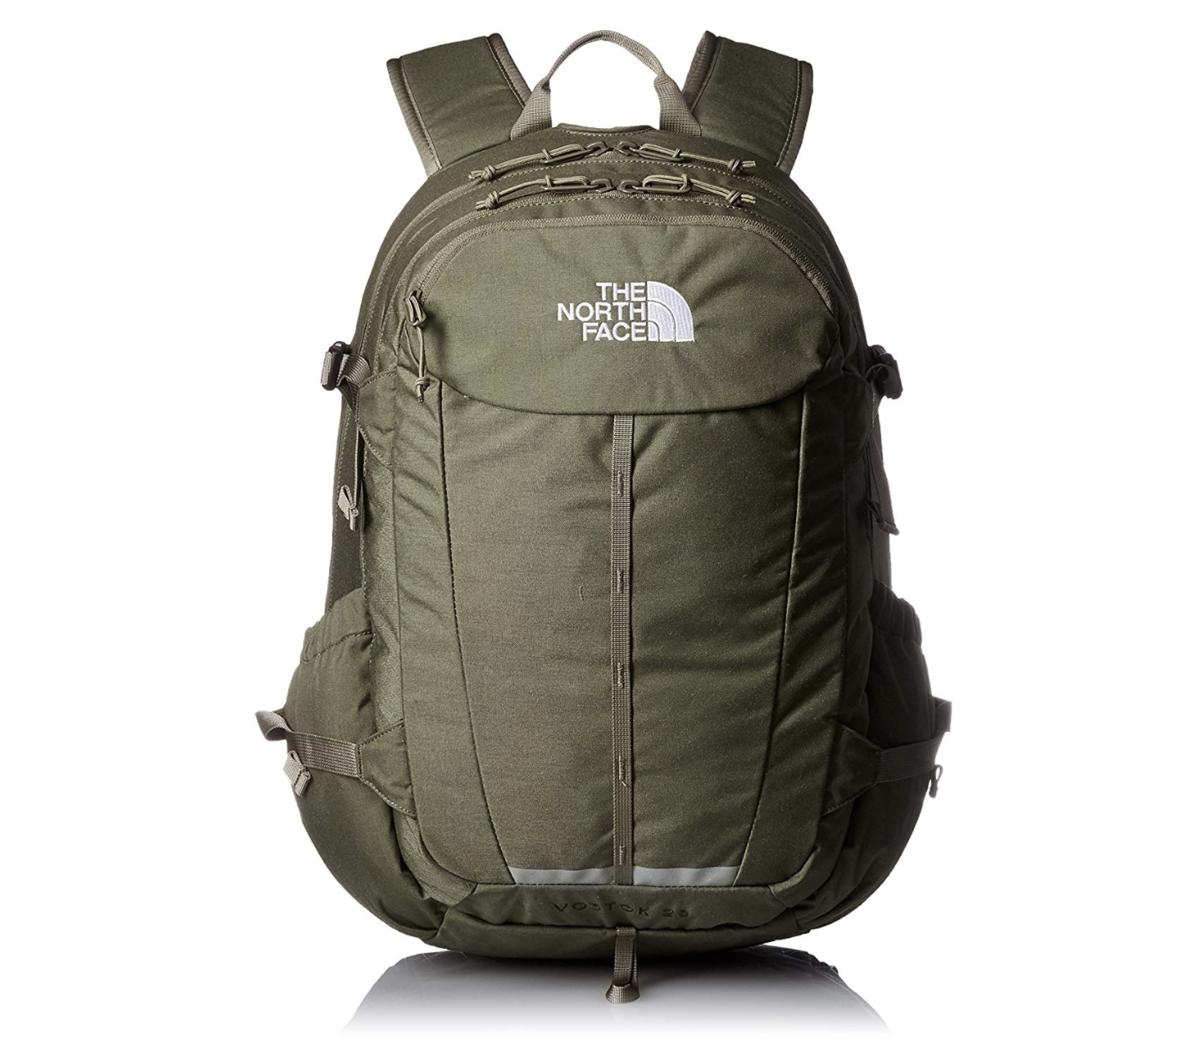 f:id:thebackpack:20190329192021p:plain